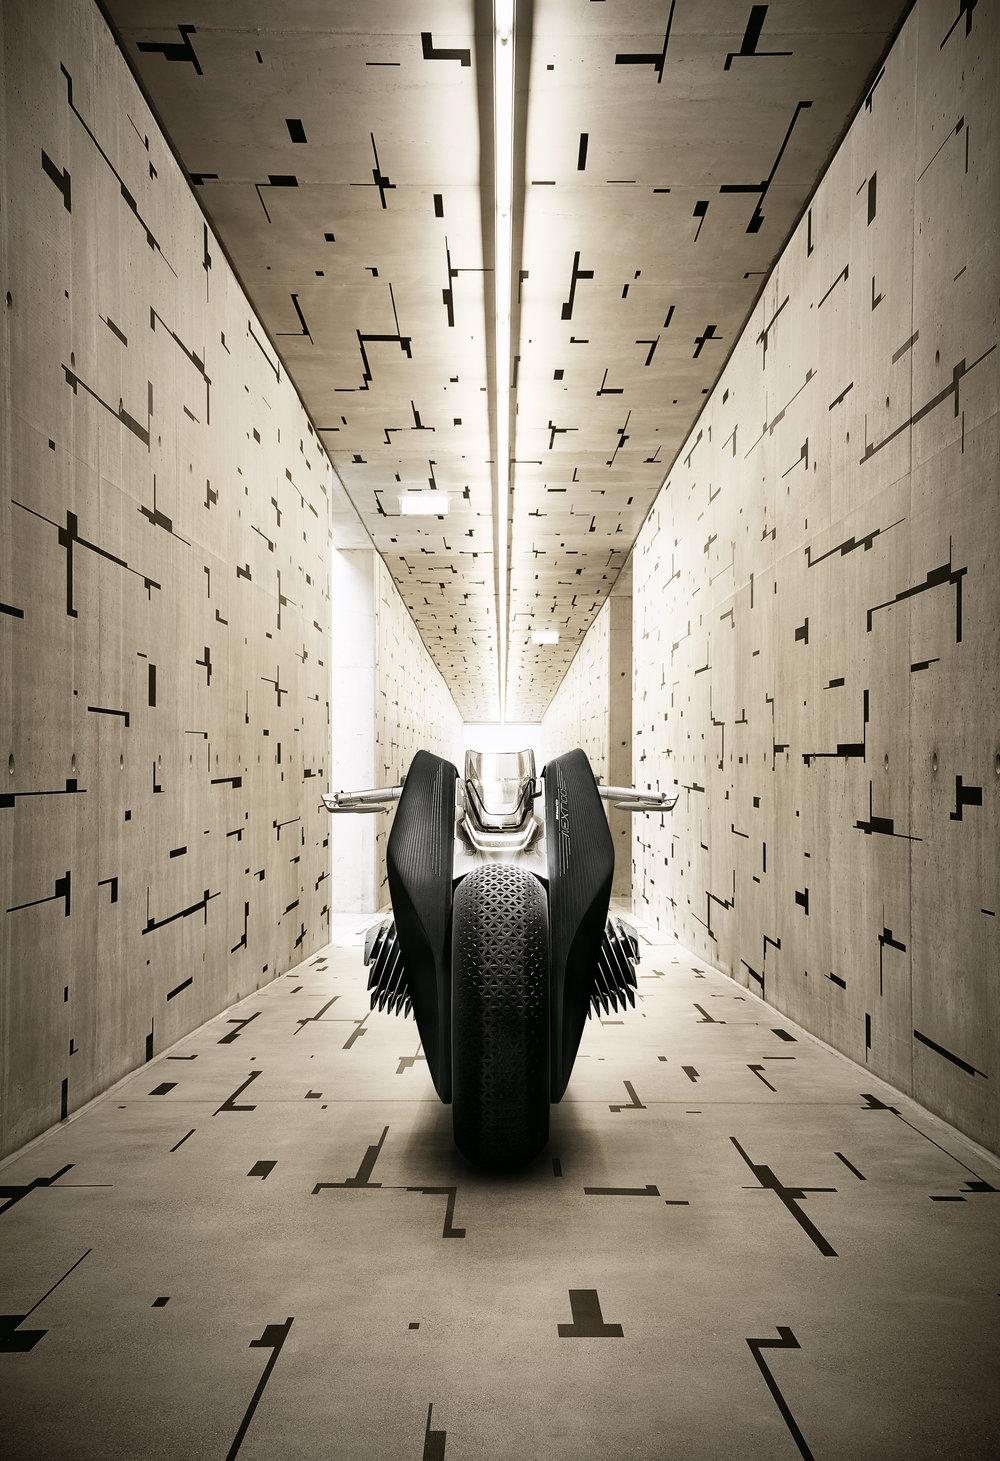 P90238708_highRes_bmw-motorrad-vision-.jpg